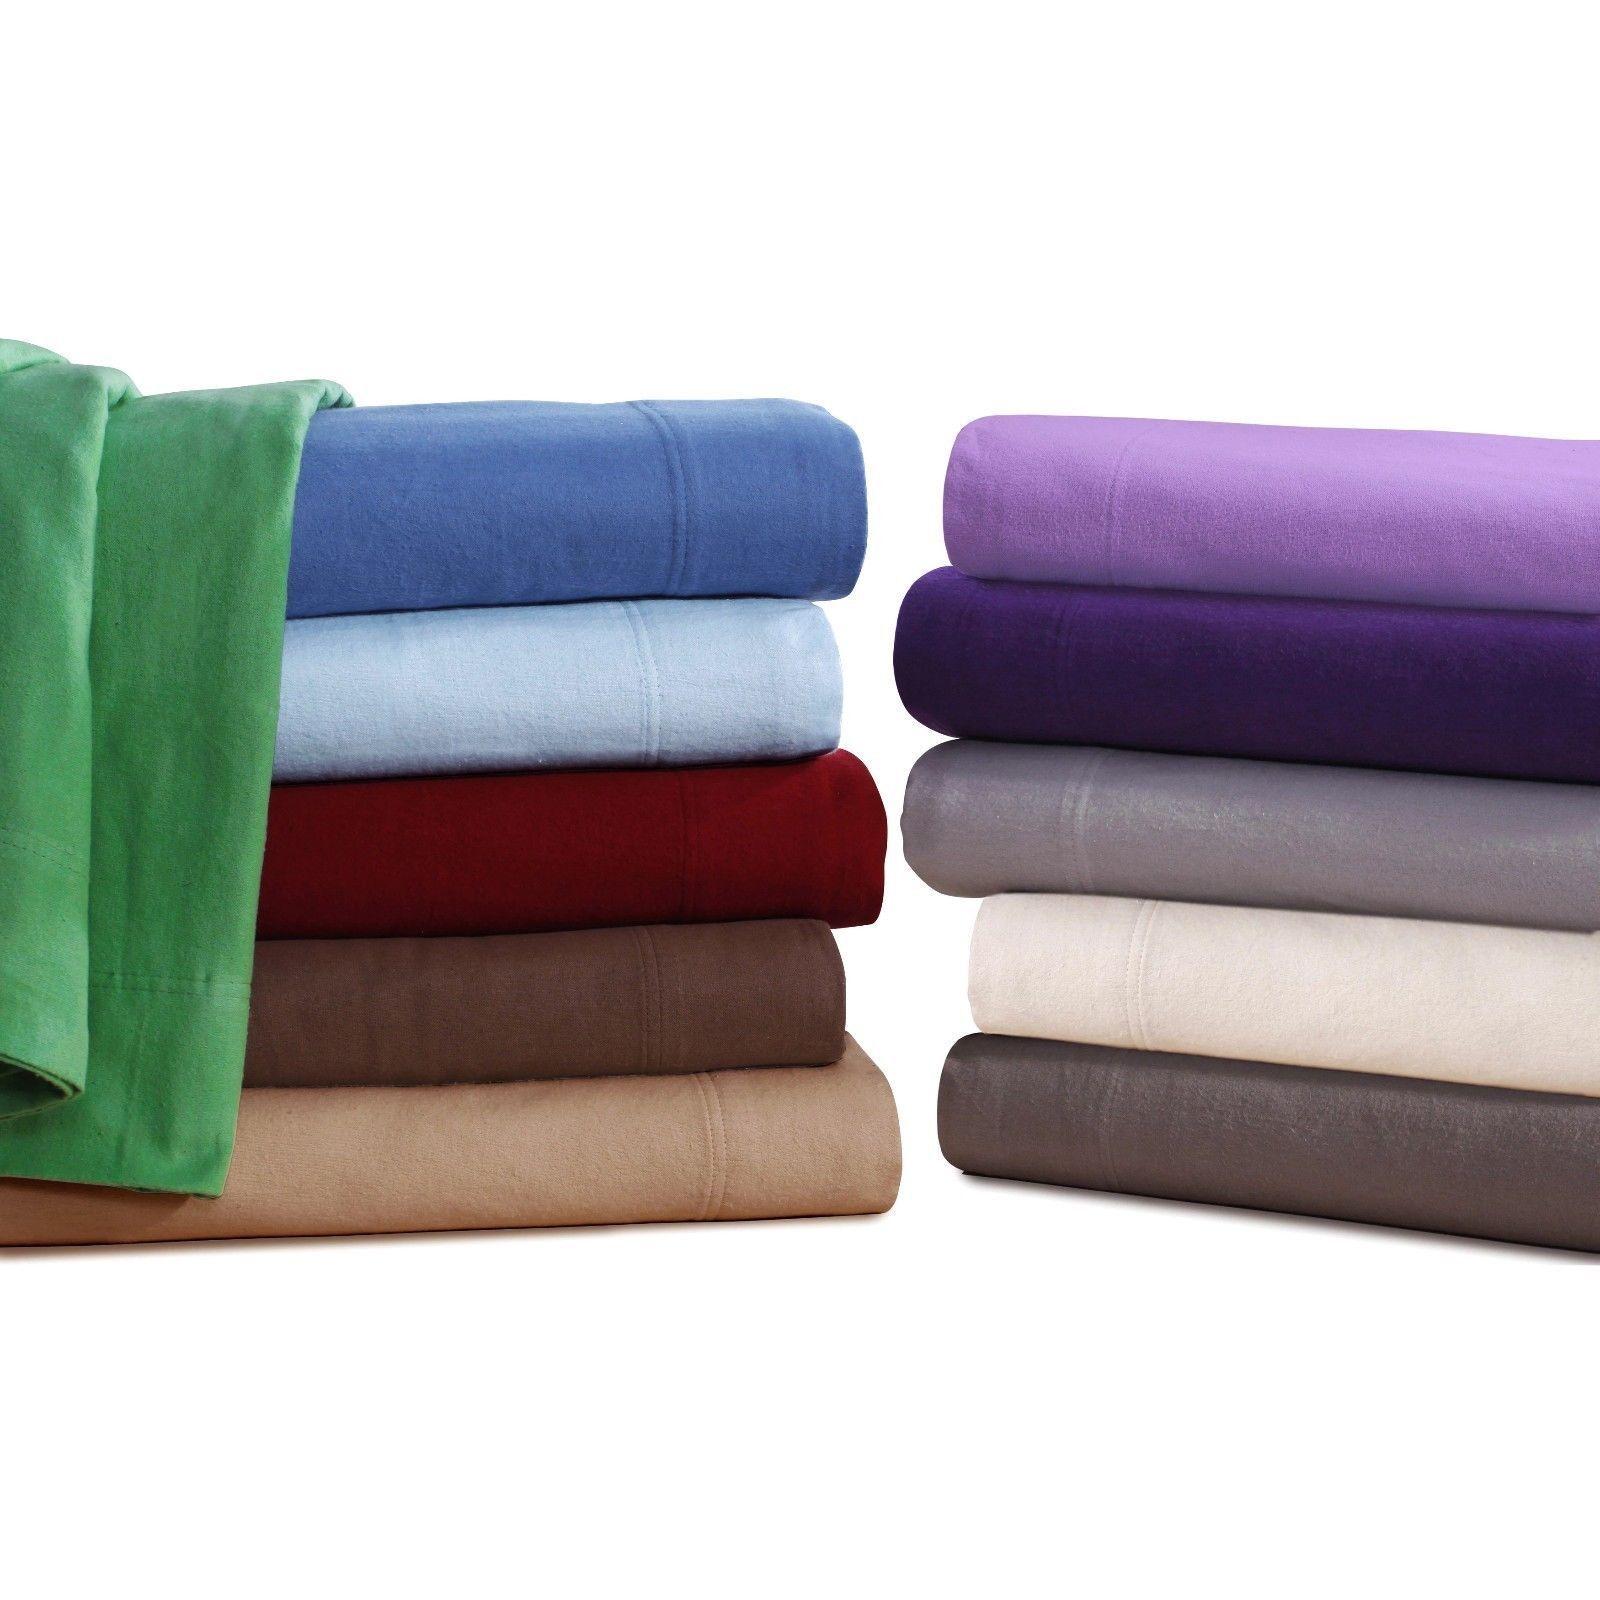 KING Flannel Sheets 5 oz Deep Pocket Ultra Soft Sheet Set 100% Cotton Many Farbe